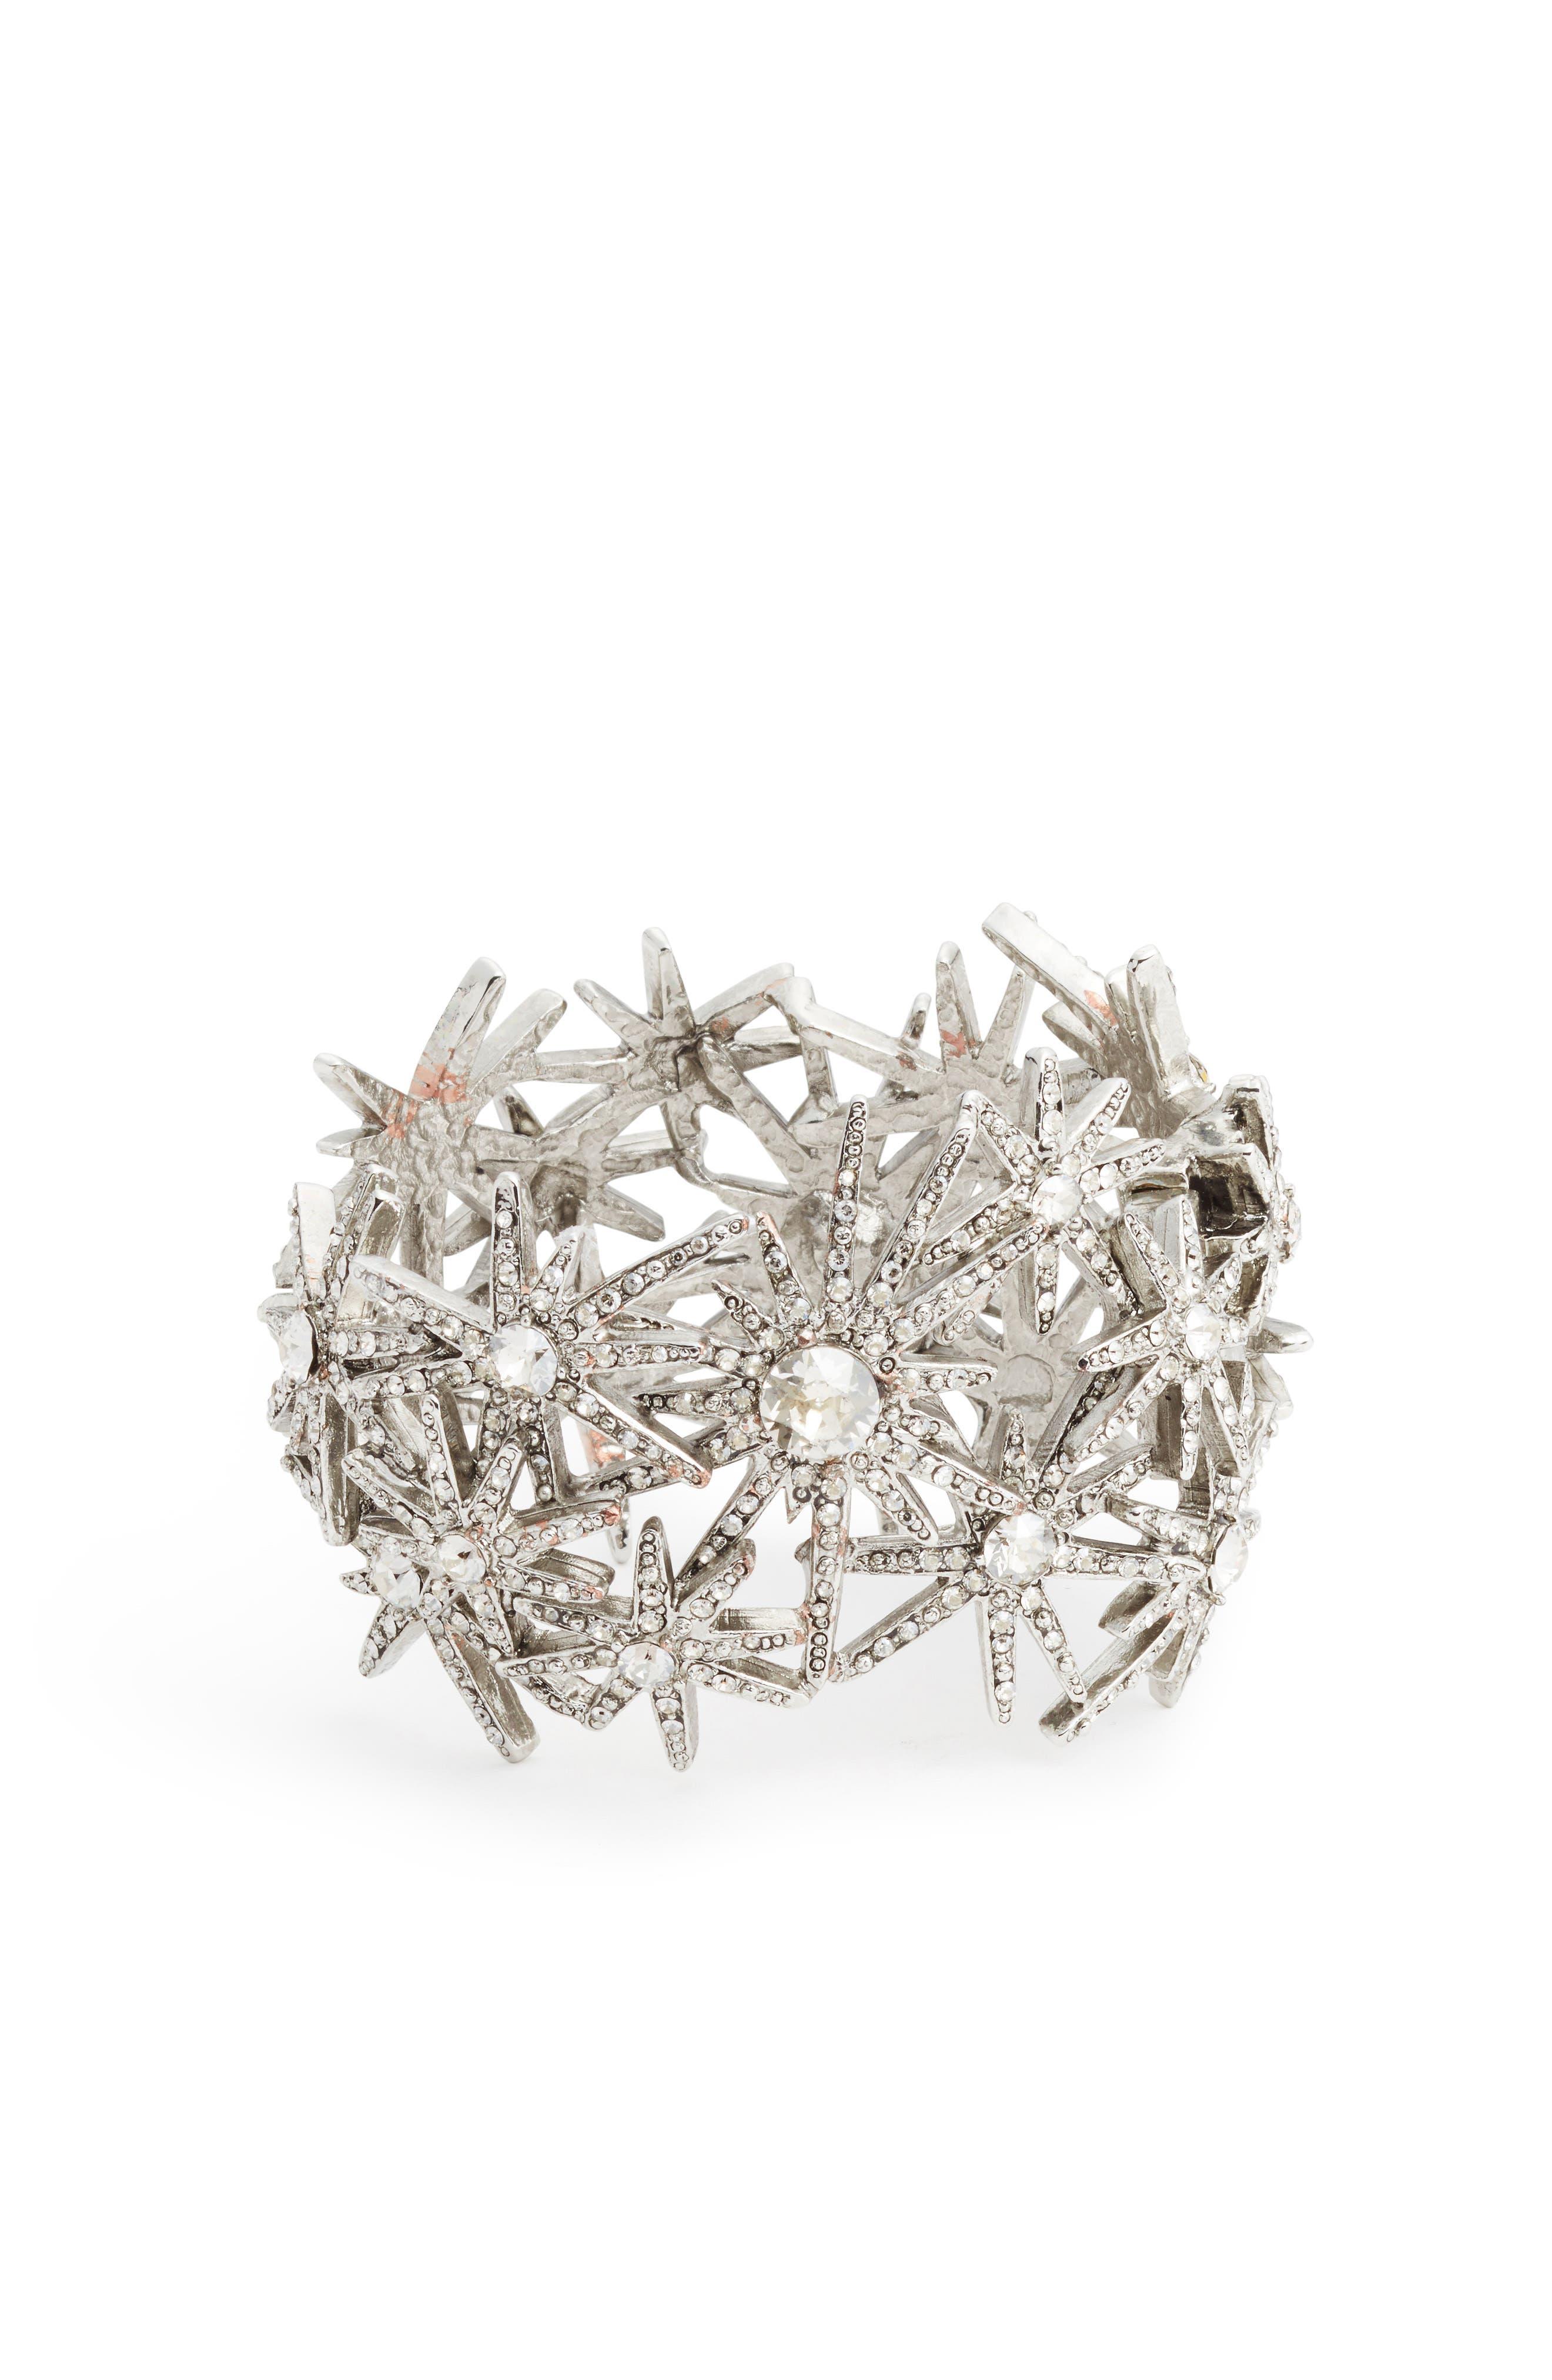 Oscar de la Renta Crystal Fireworks Bracelet